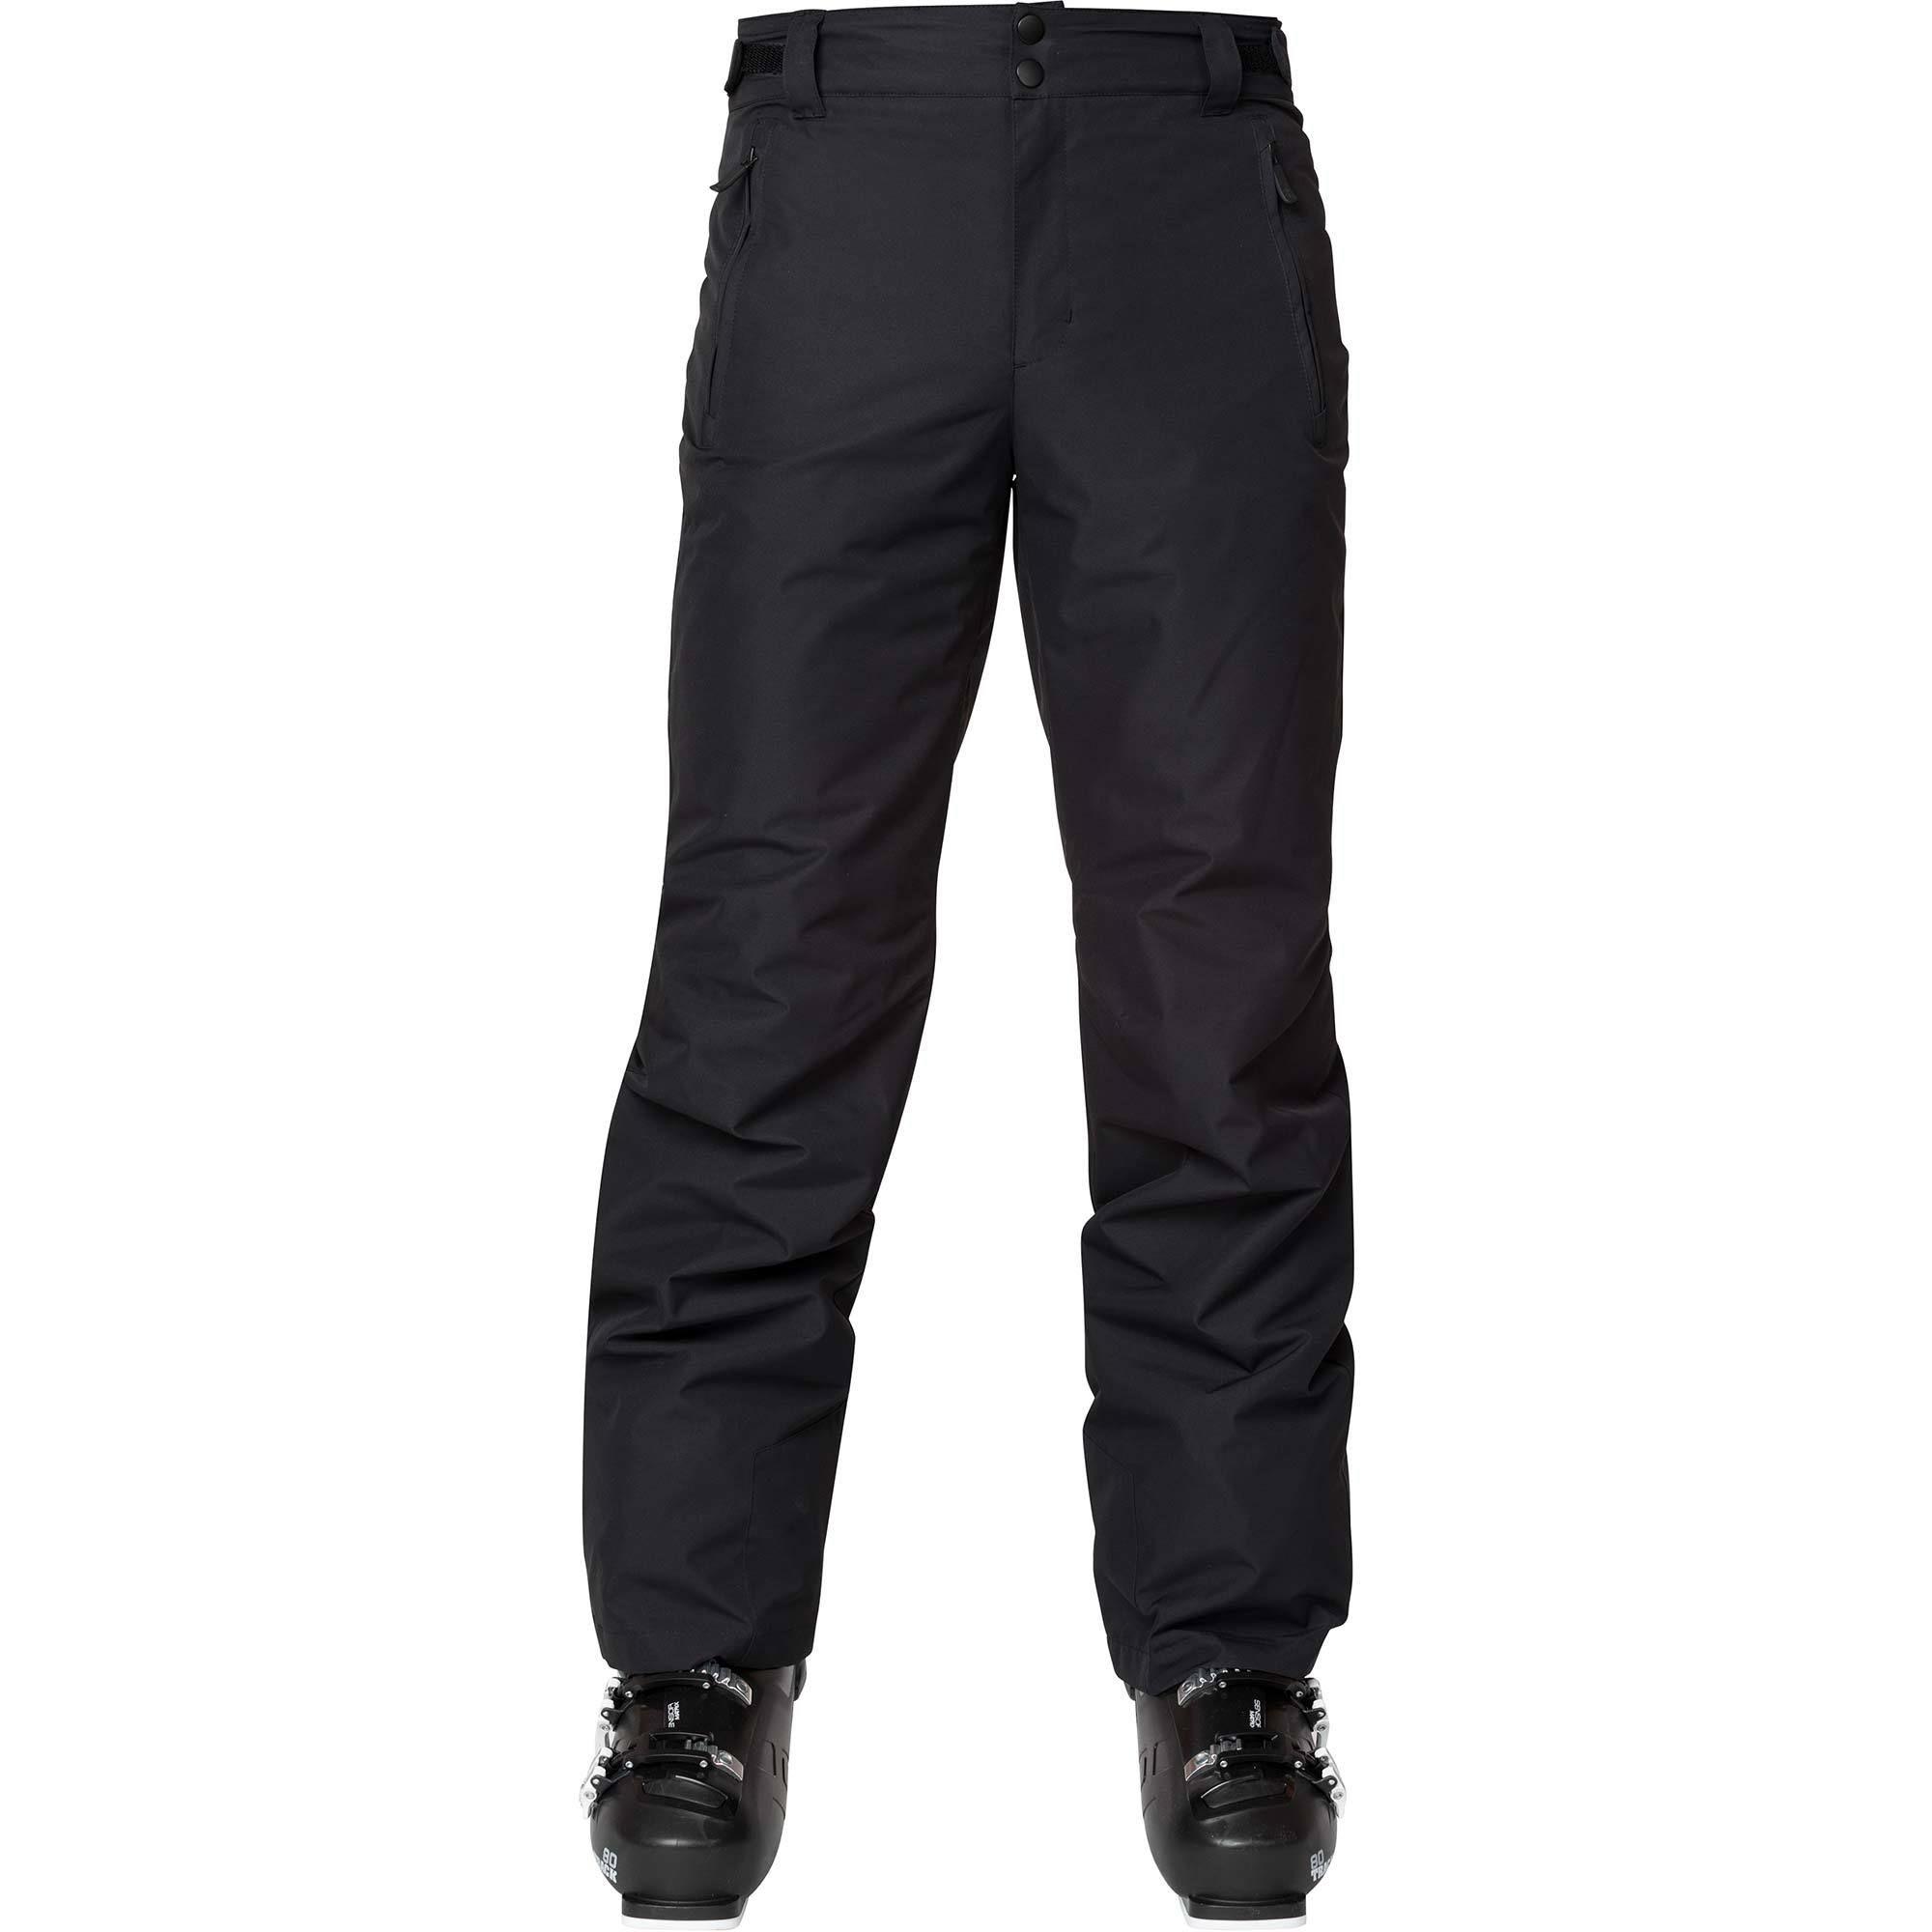 Rossignol RAPIDE PANT black - Speck-Sports cbc4bdb31c0c